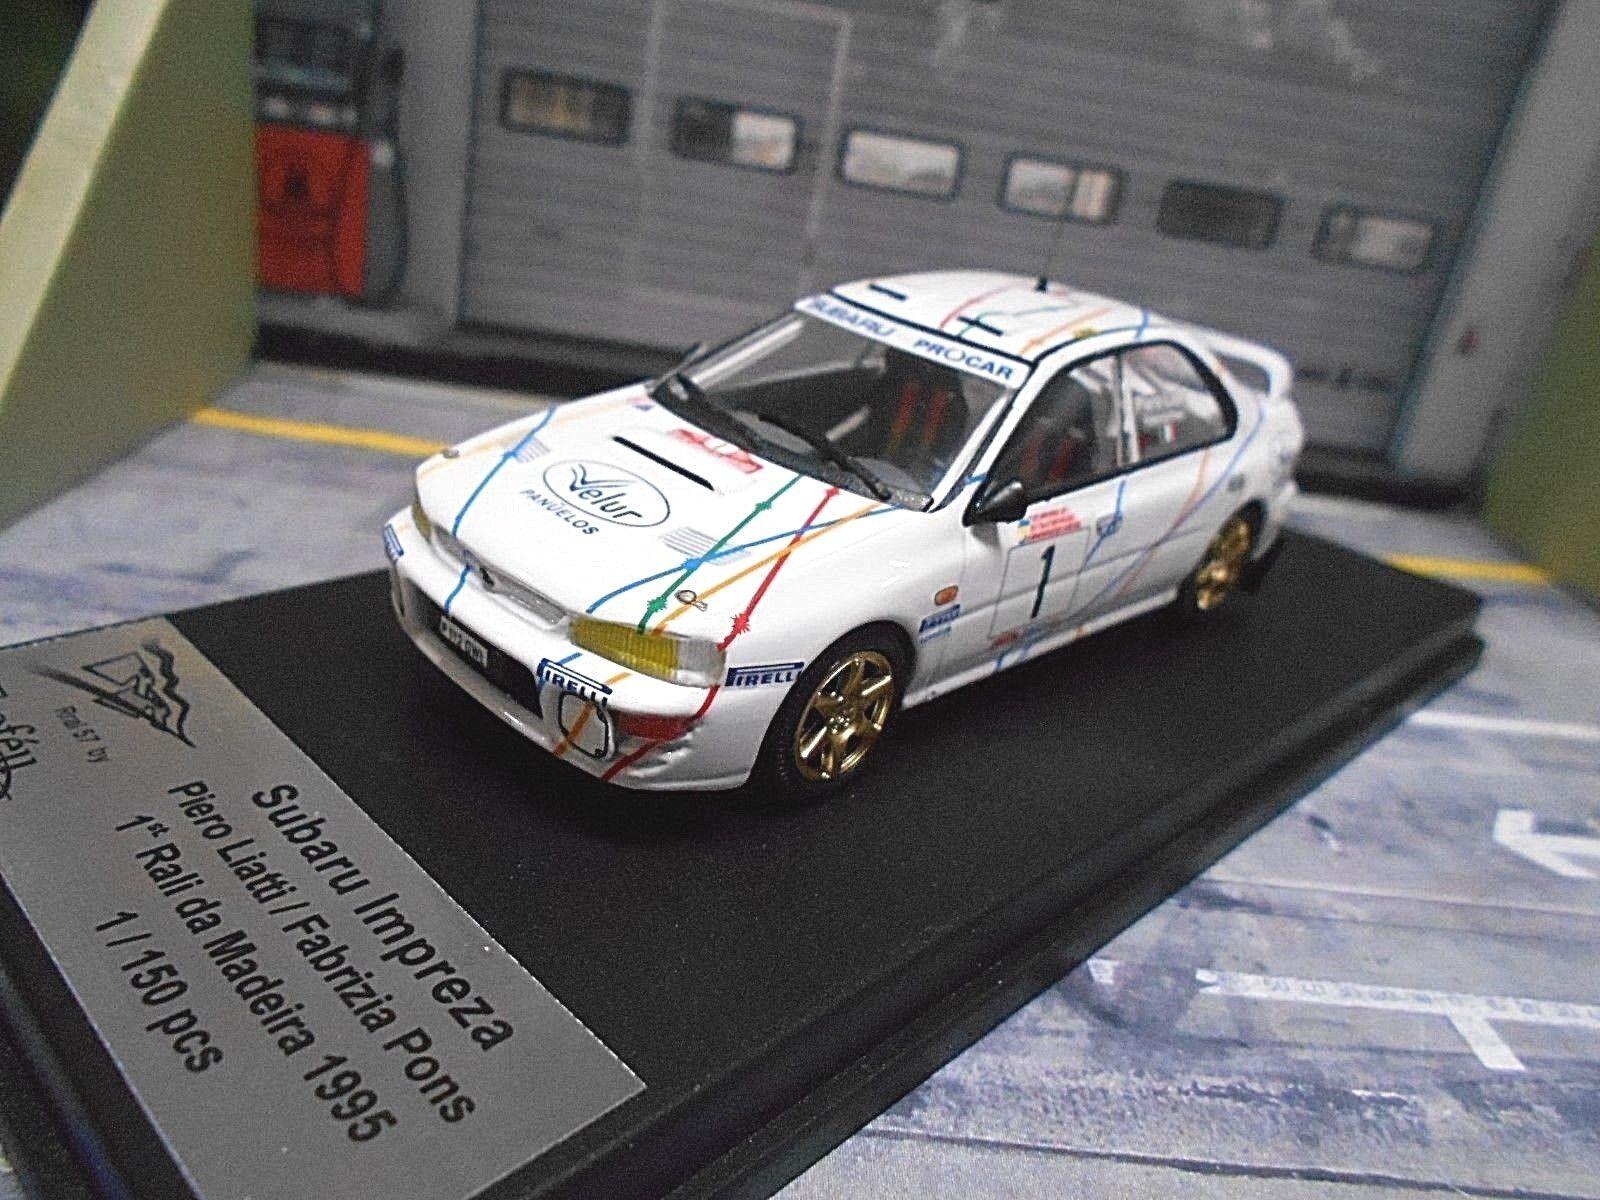 Subaru Impreza WRC Rallye de Madère 1995 WINNER  1 Liatti Pons Velur Trofeu 1 43